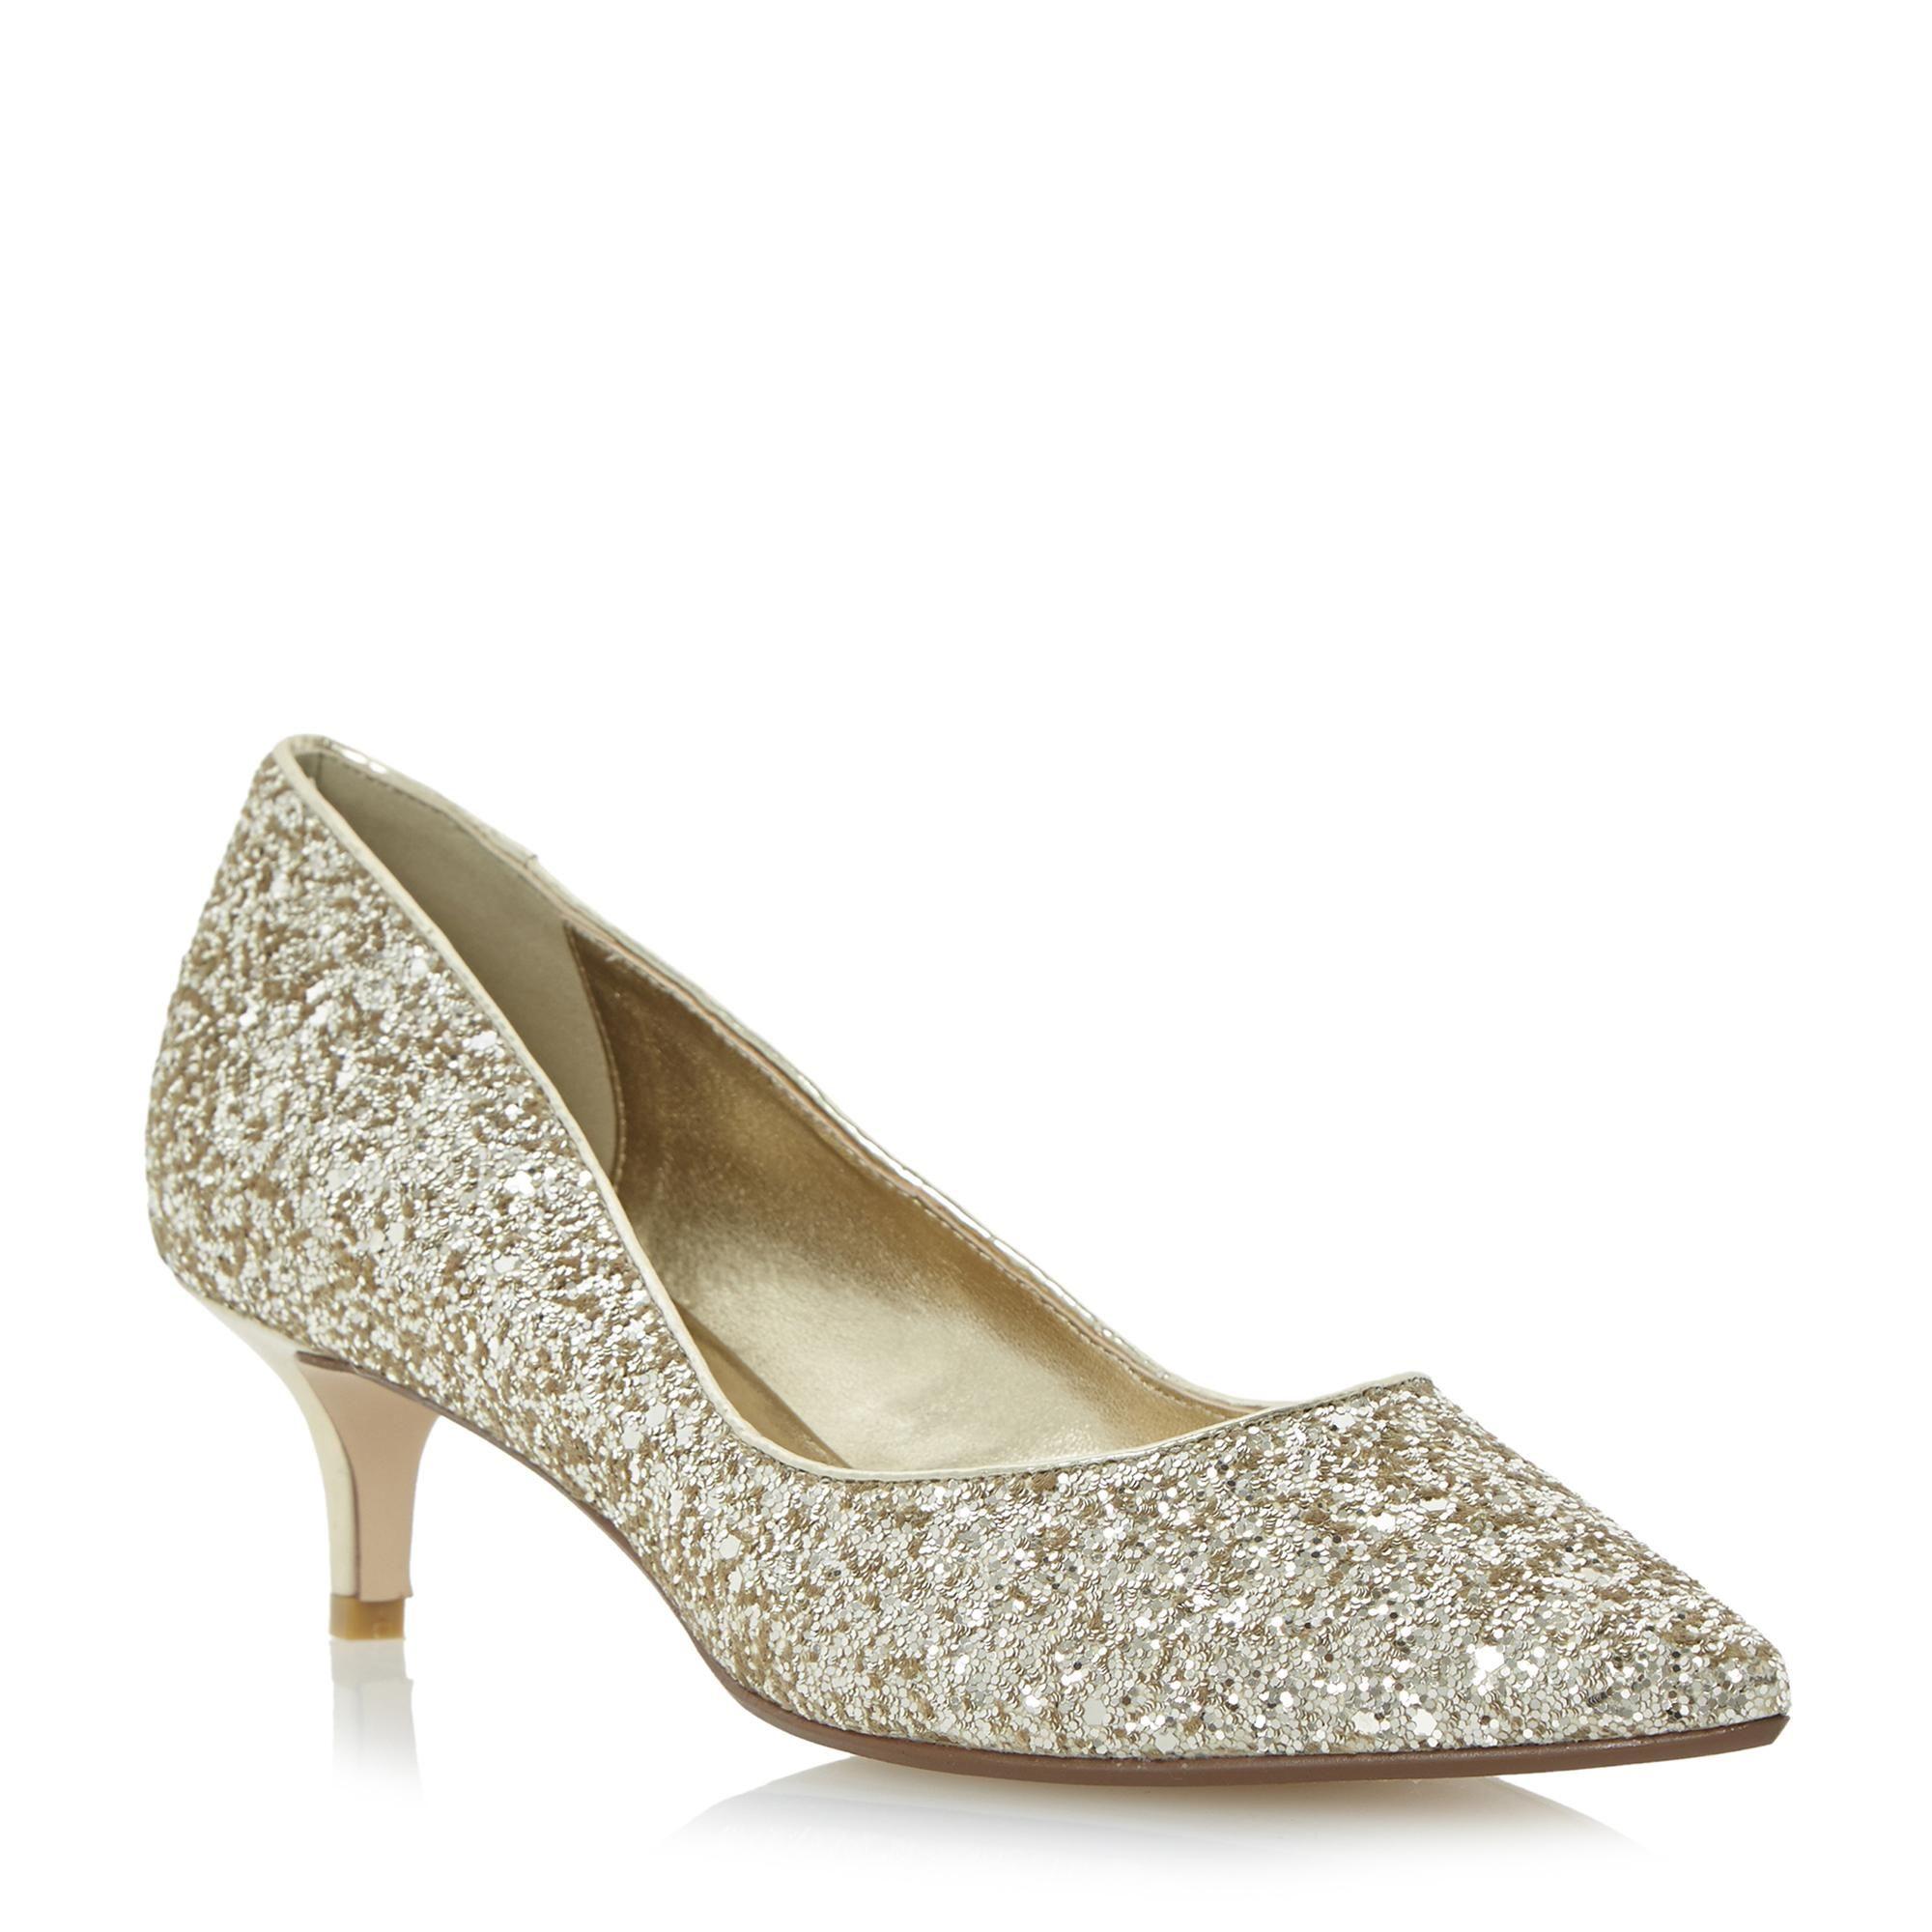 ea0c10ad3fe DUNE LADIES BLITZEN - Glitter Kitten Heel Court Shoe - gold